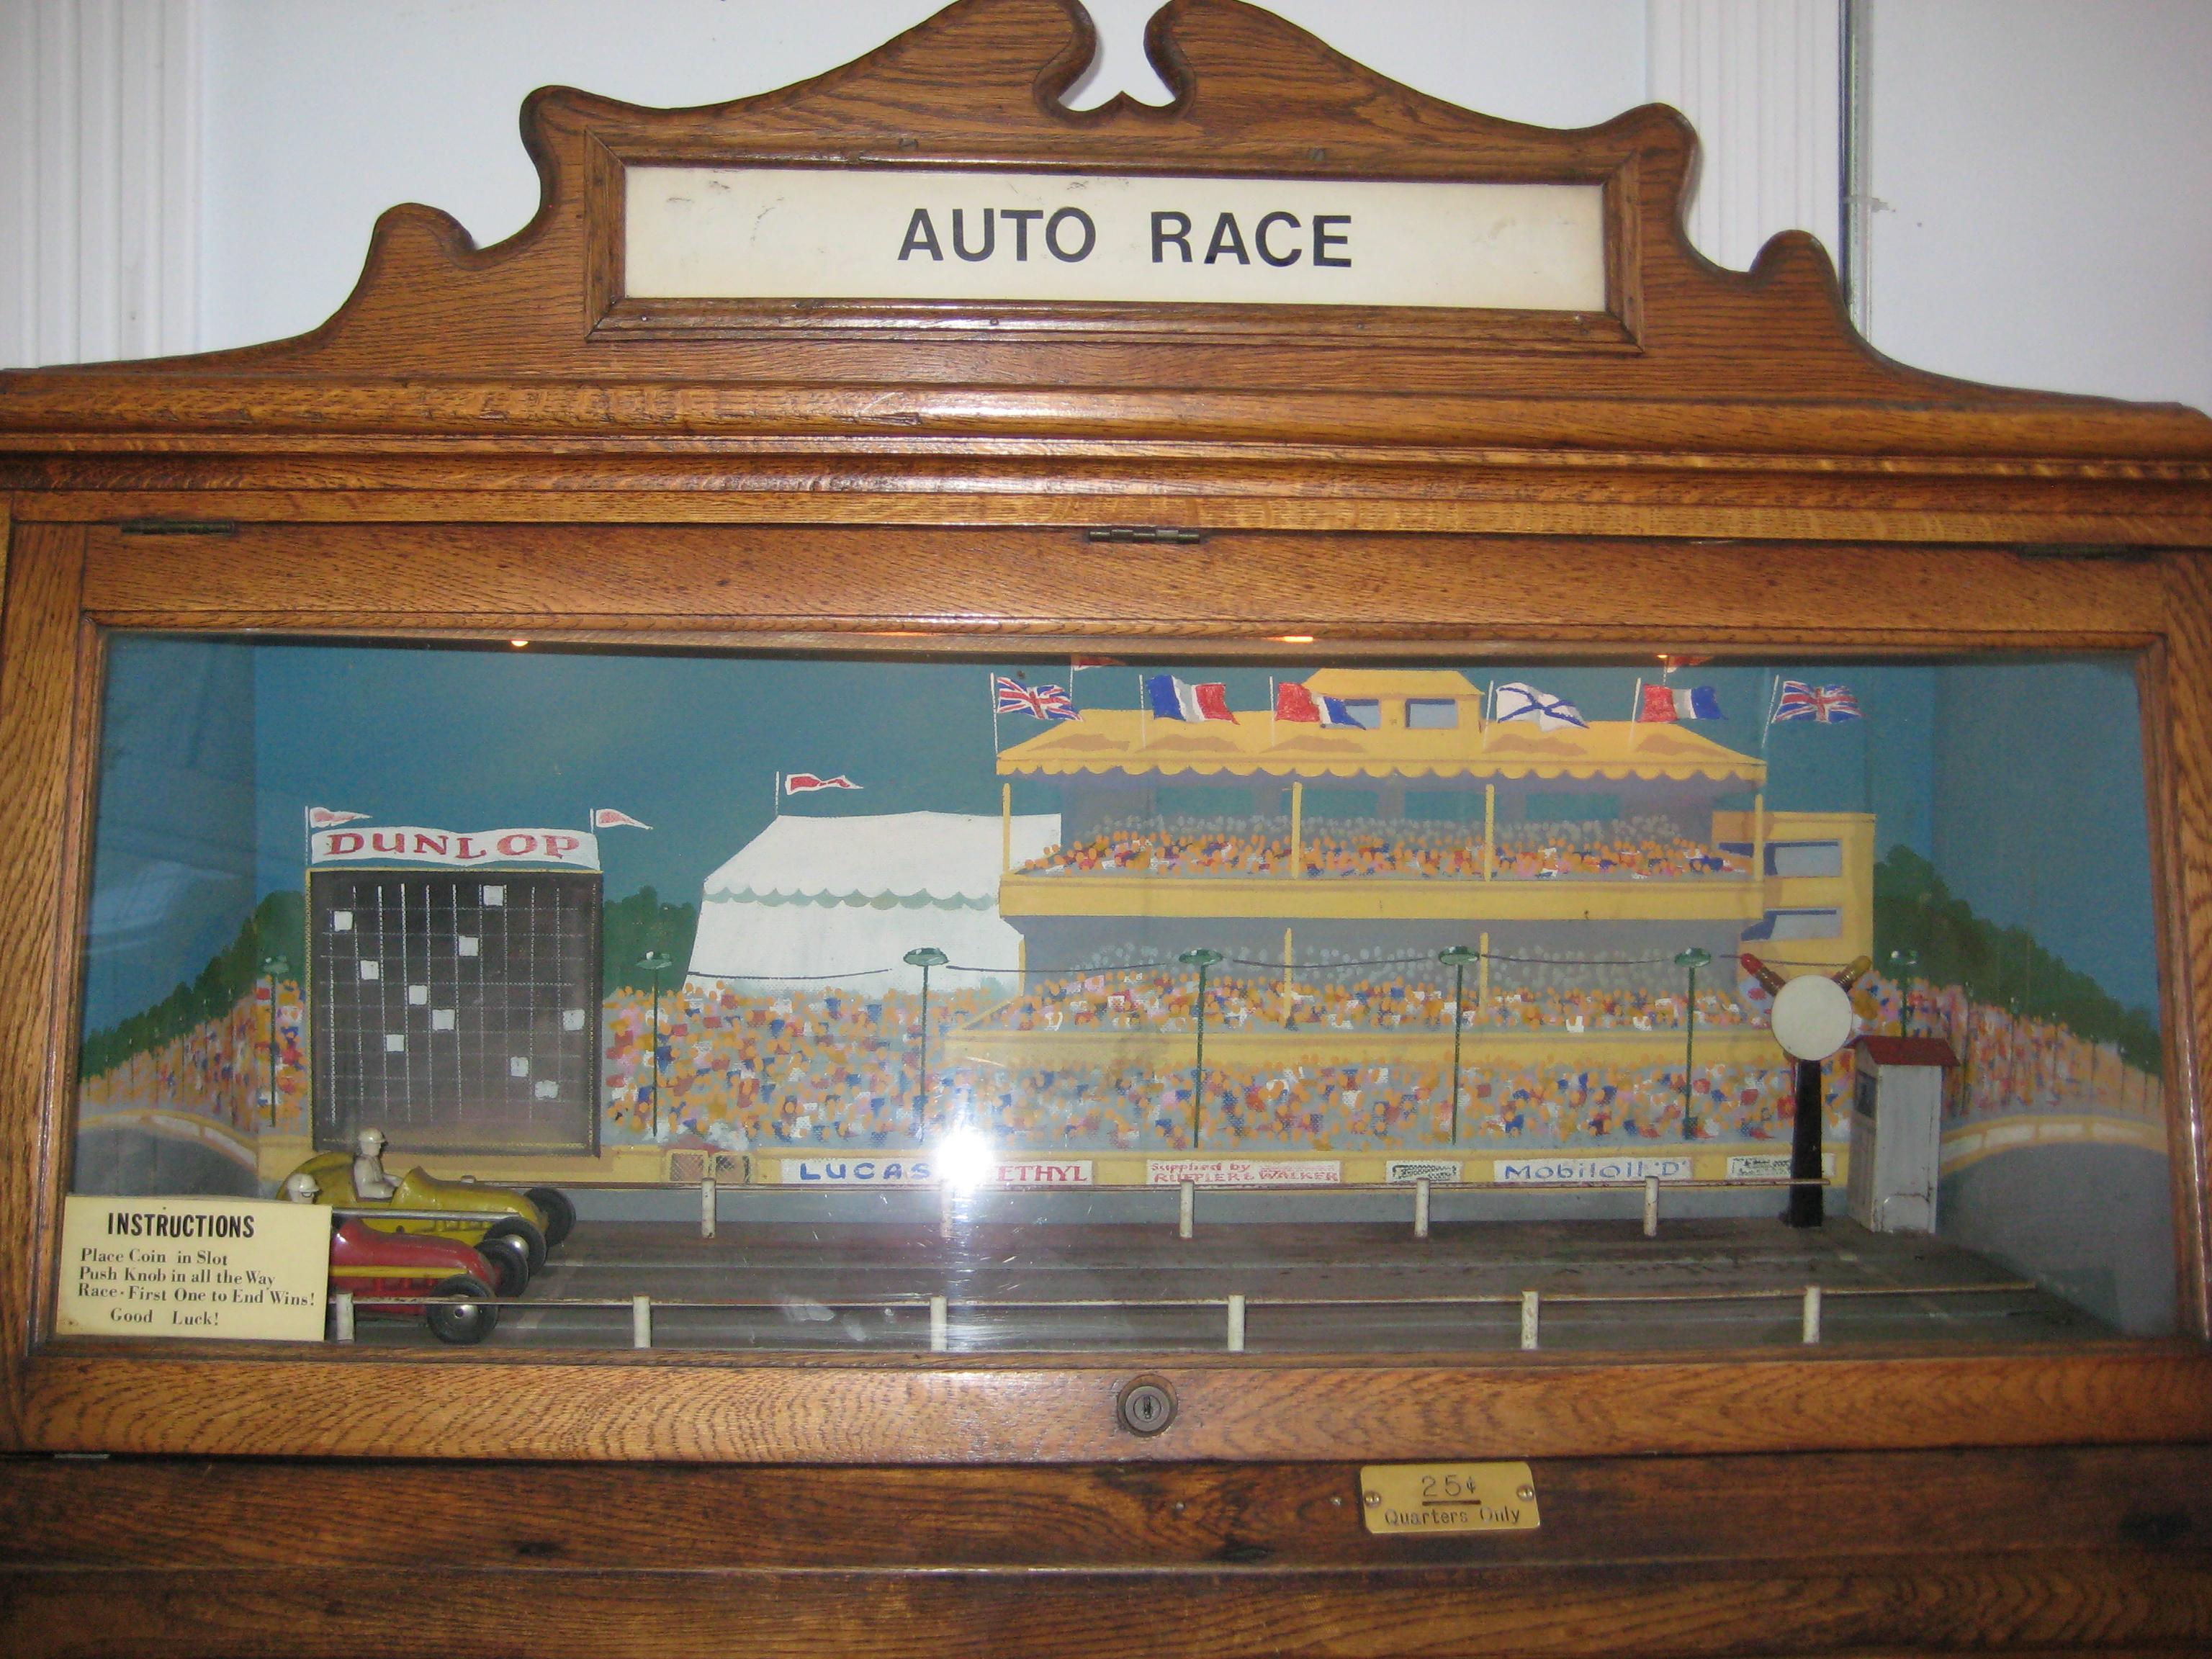 Musee' Mecanique